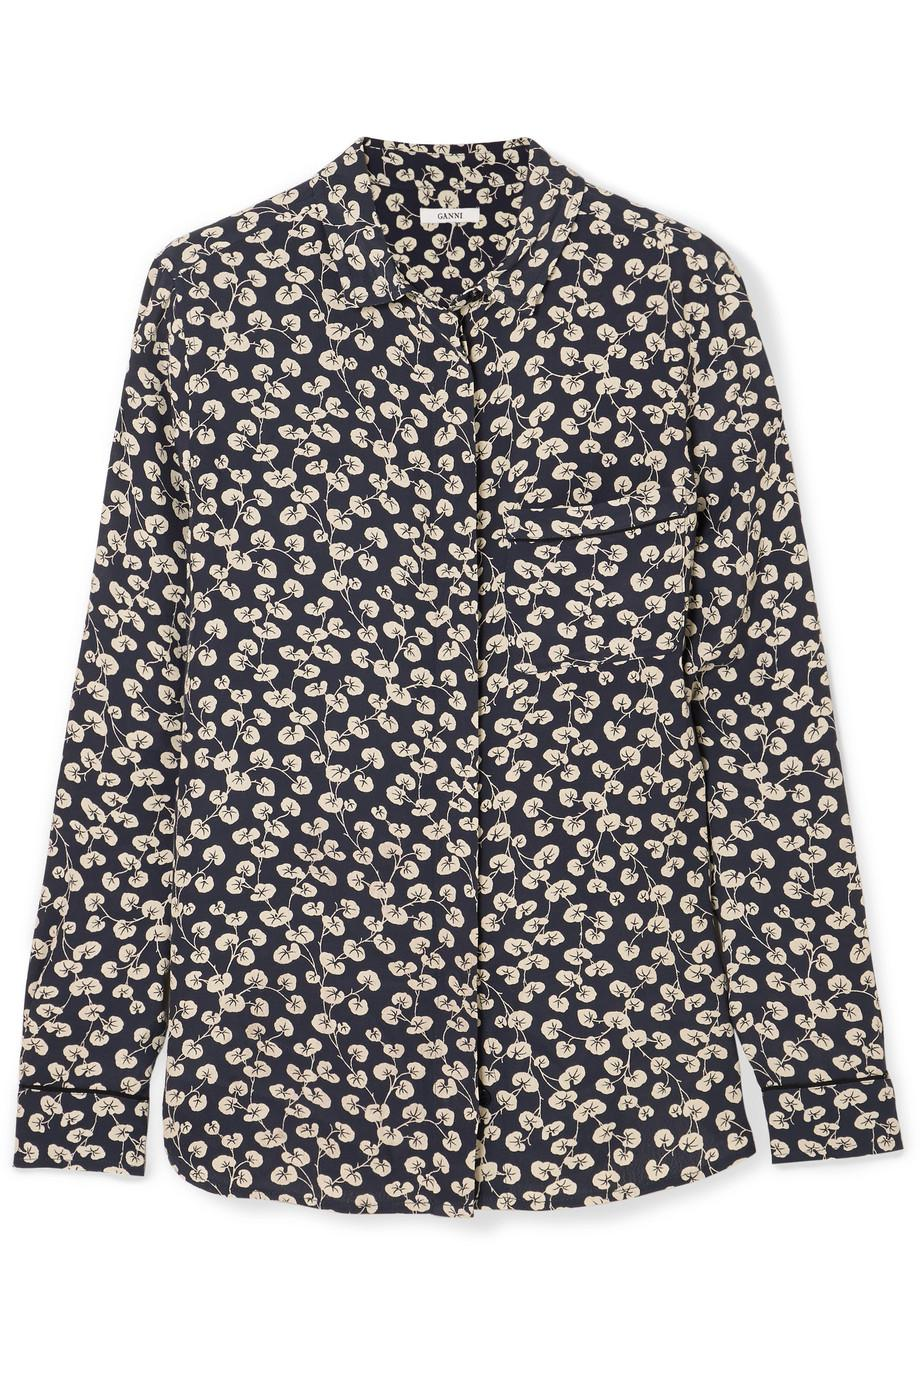 9d23352e Ganni Roseburg Printed Crepe De Chine Shirt in Blue - Lyst